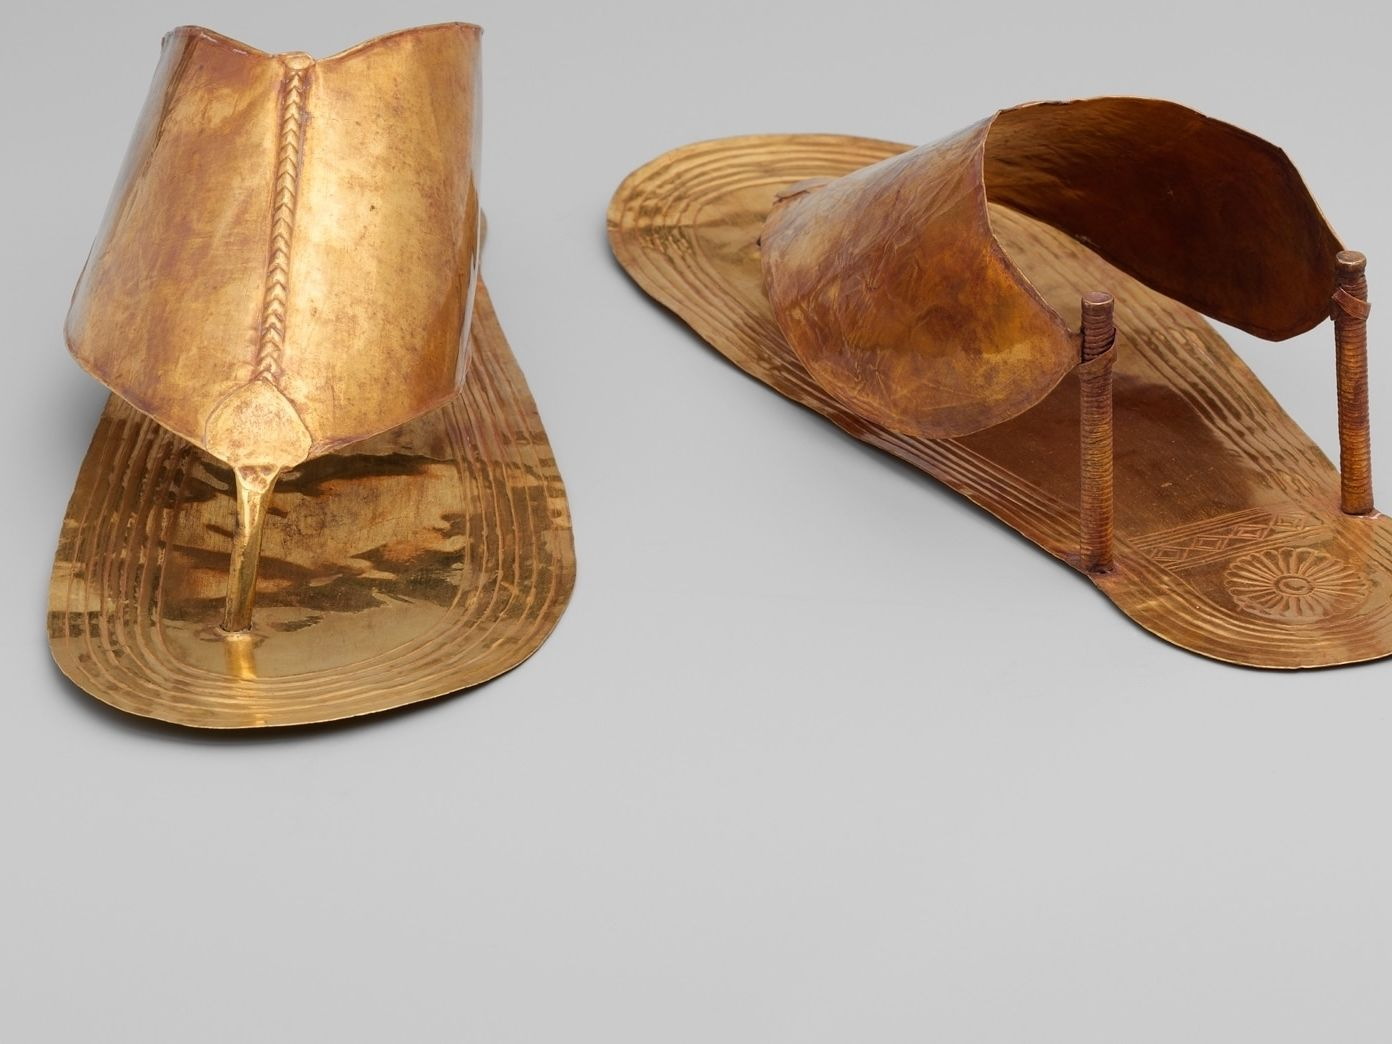 sandale-egypte-histoire-or